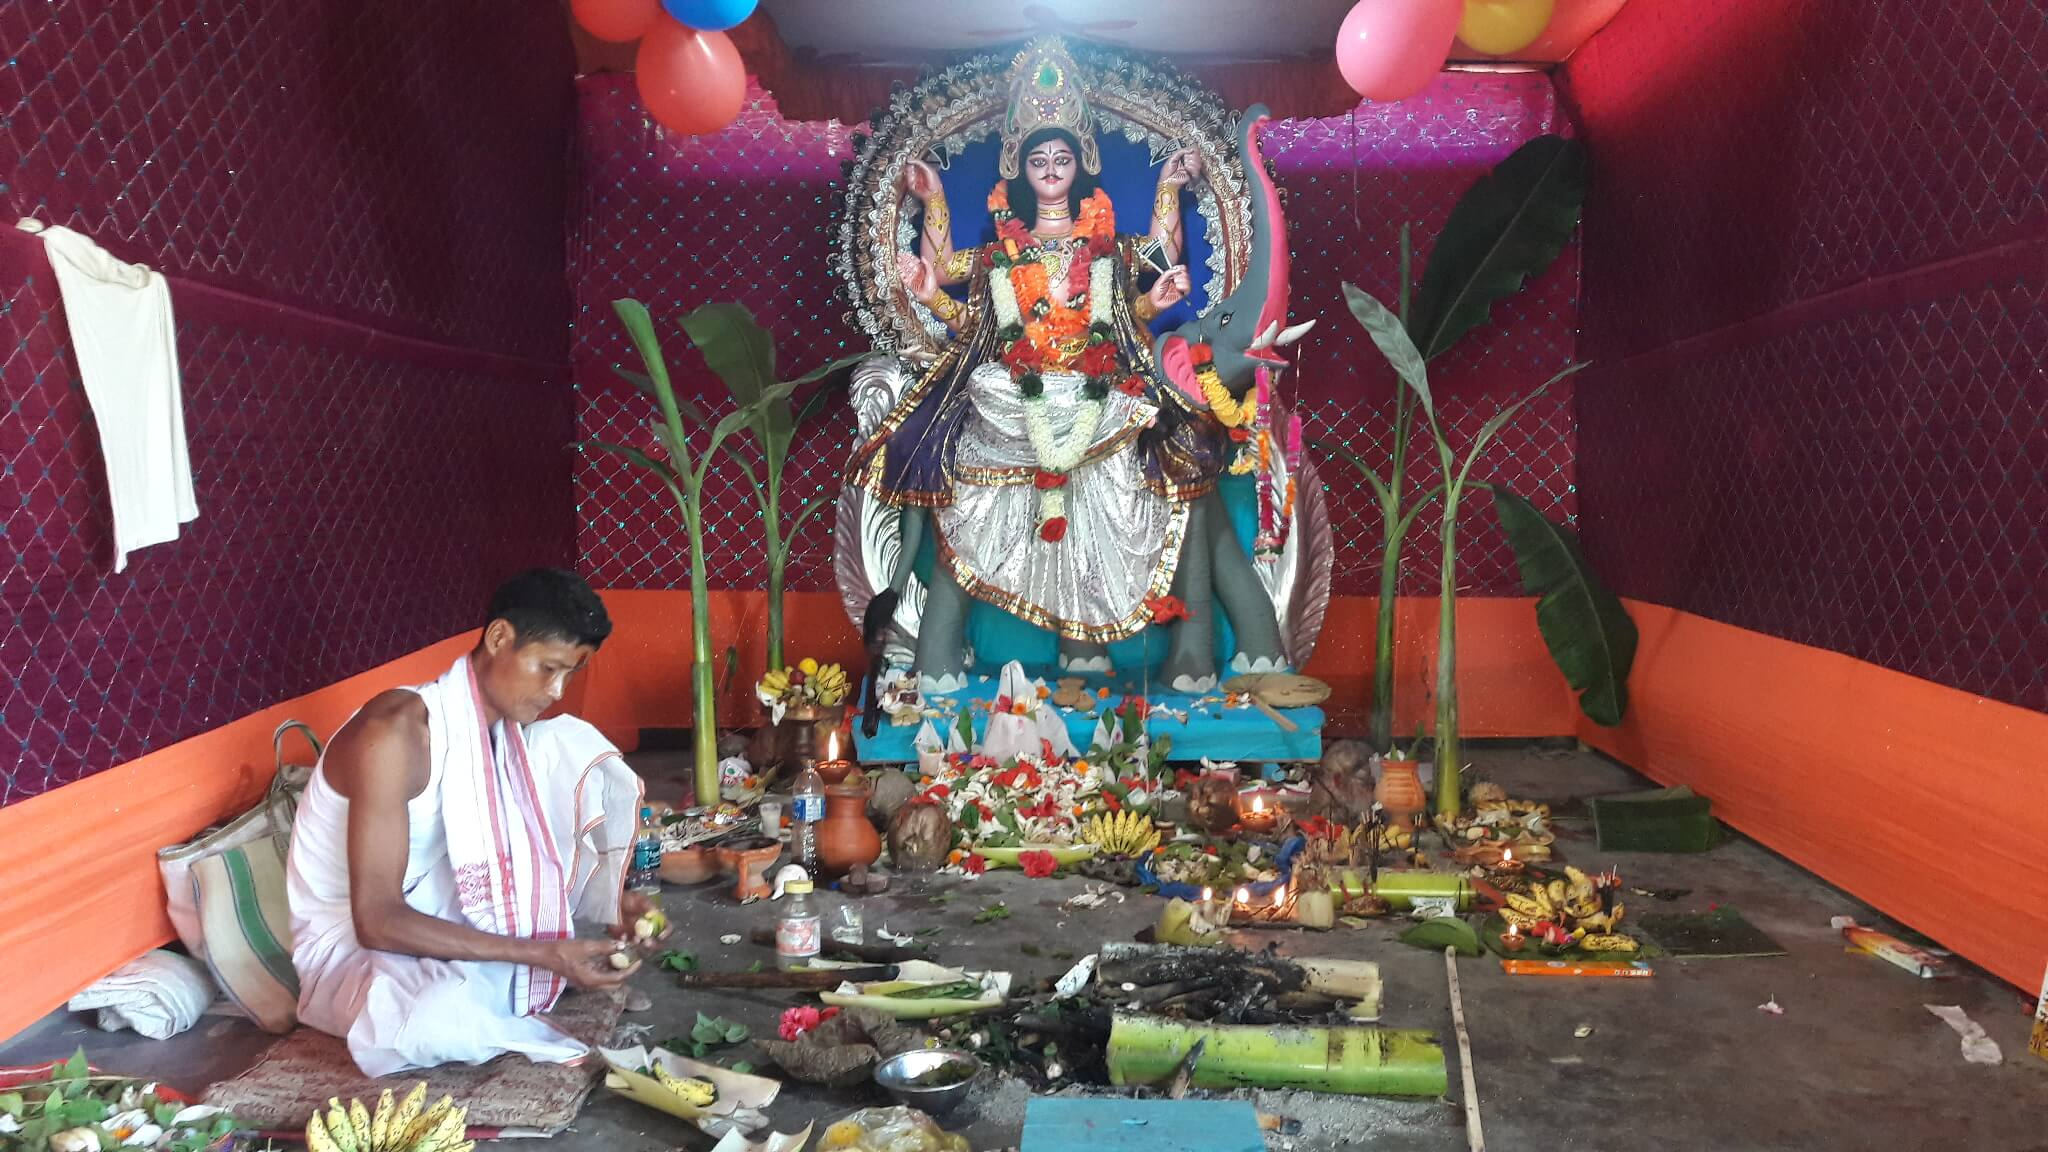 Vishwakarma Puja Celebrated with Pomp and Grandeur Across Assam